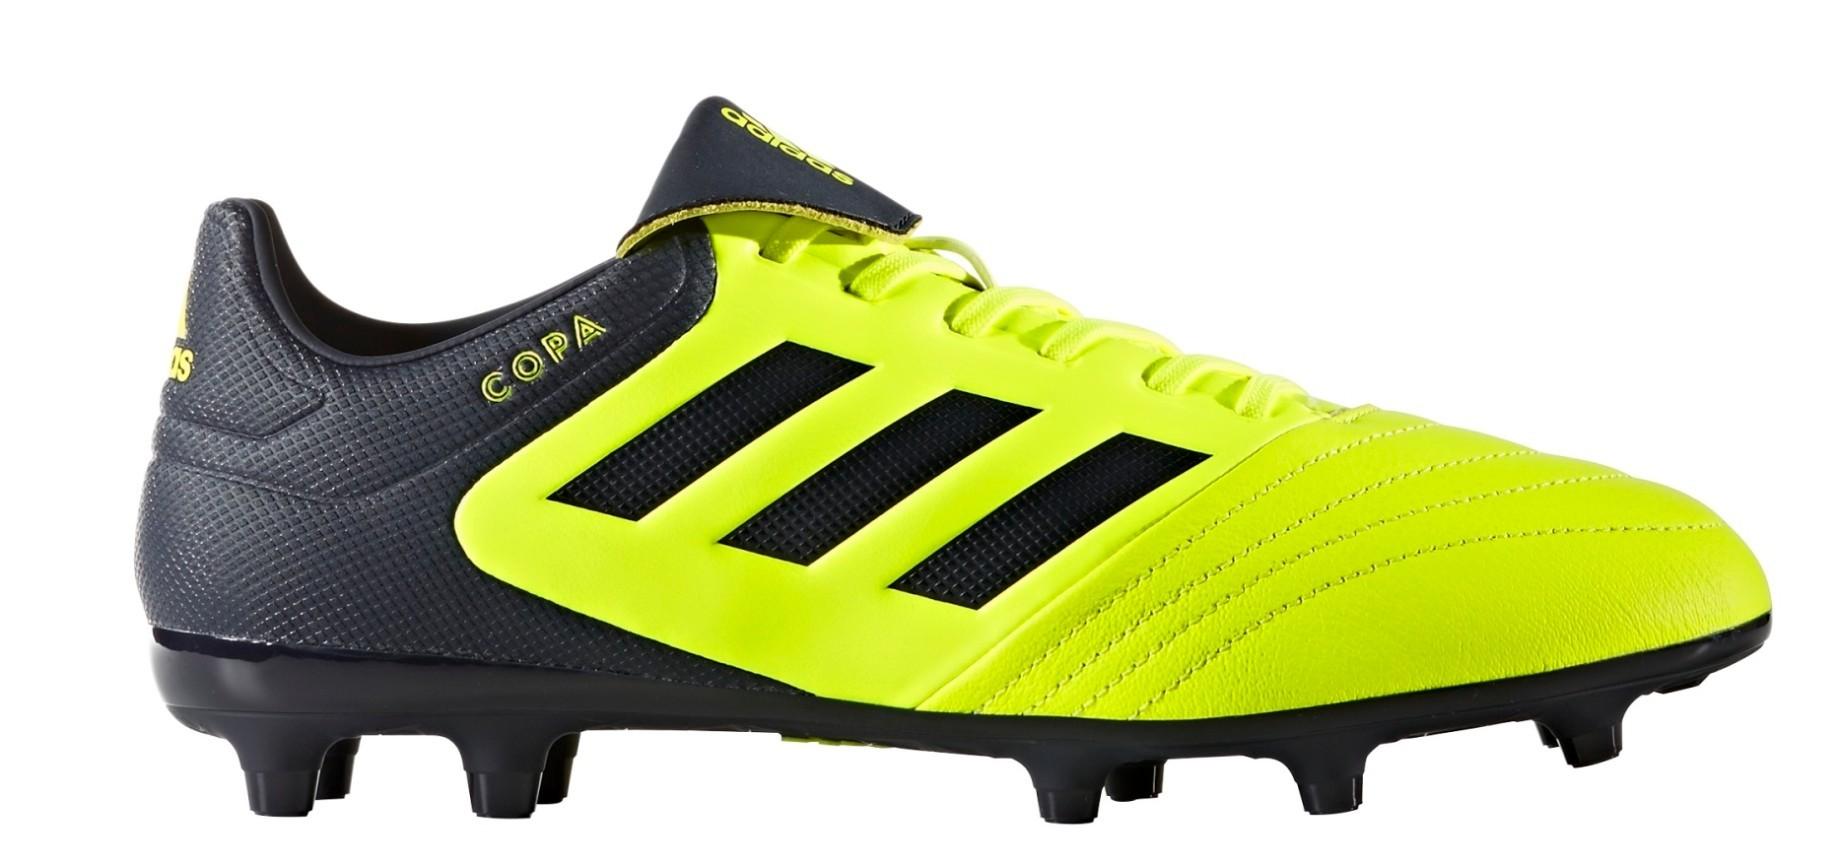 e2b103446fa Football boots Adidas Copa 17.3 FG Ocean Storm Pack colore Yellow - Adidas  - SportIT.com